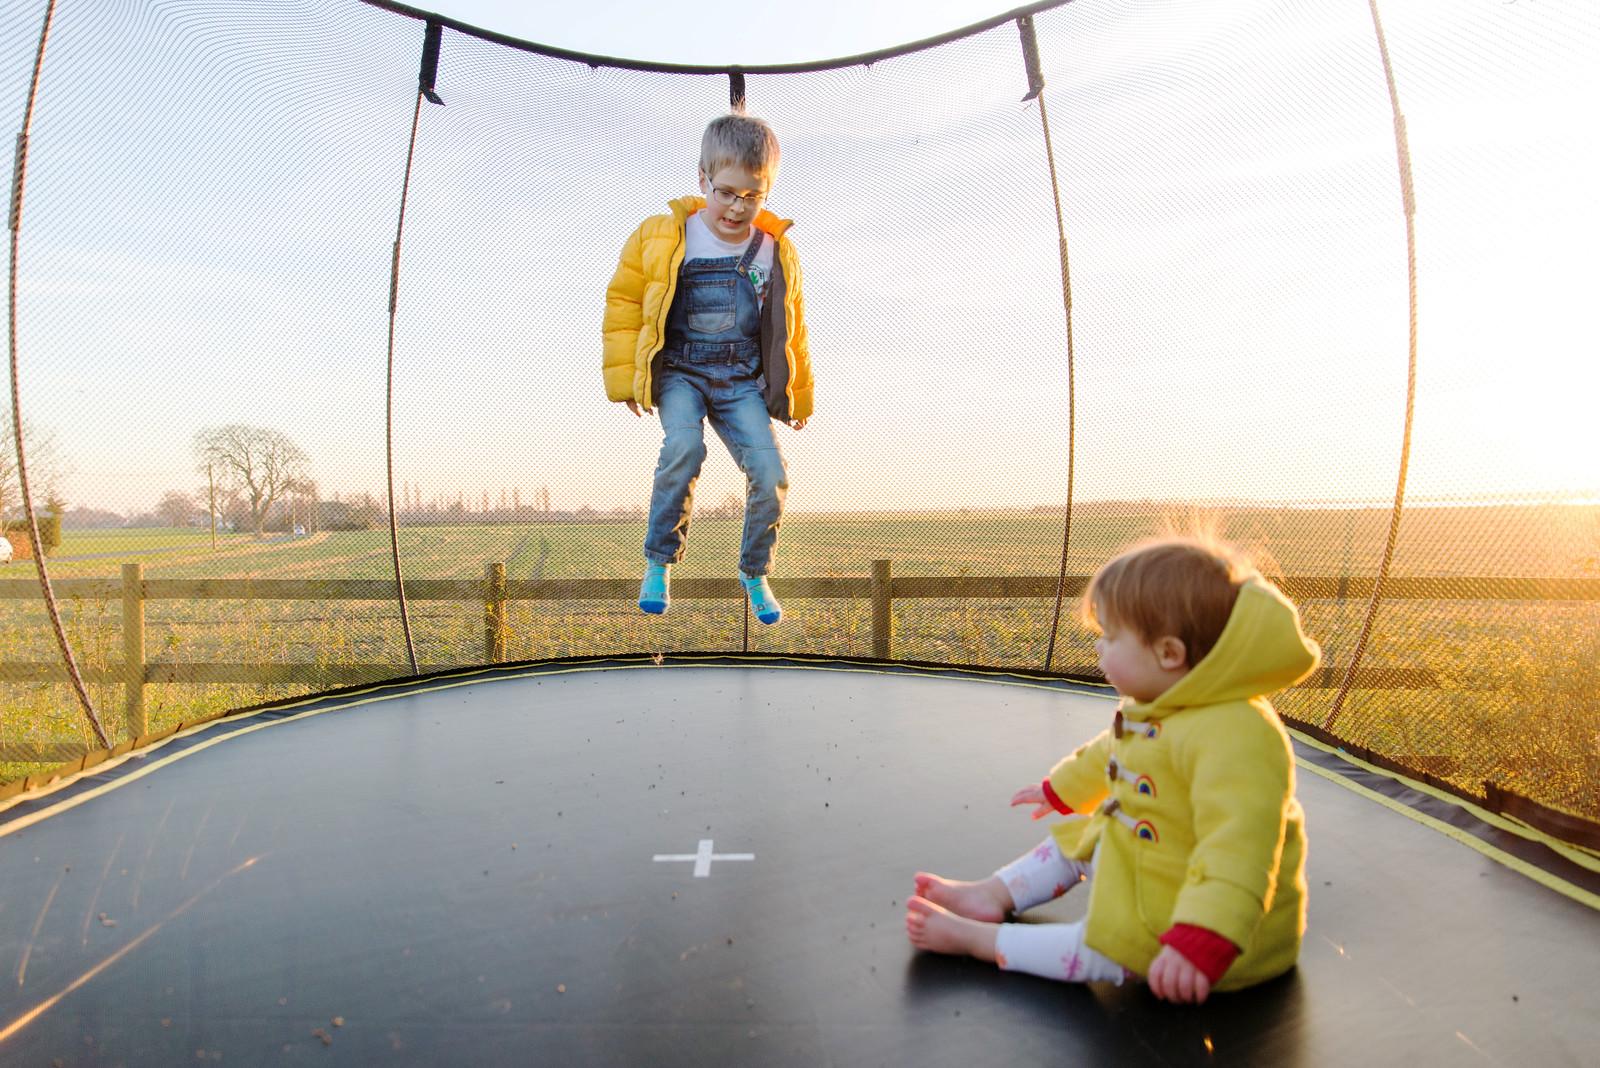 trampoline_190117_edit